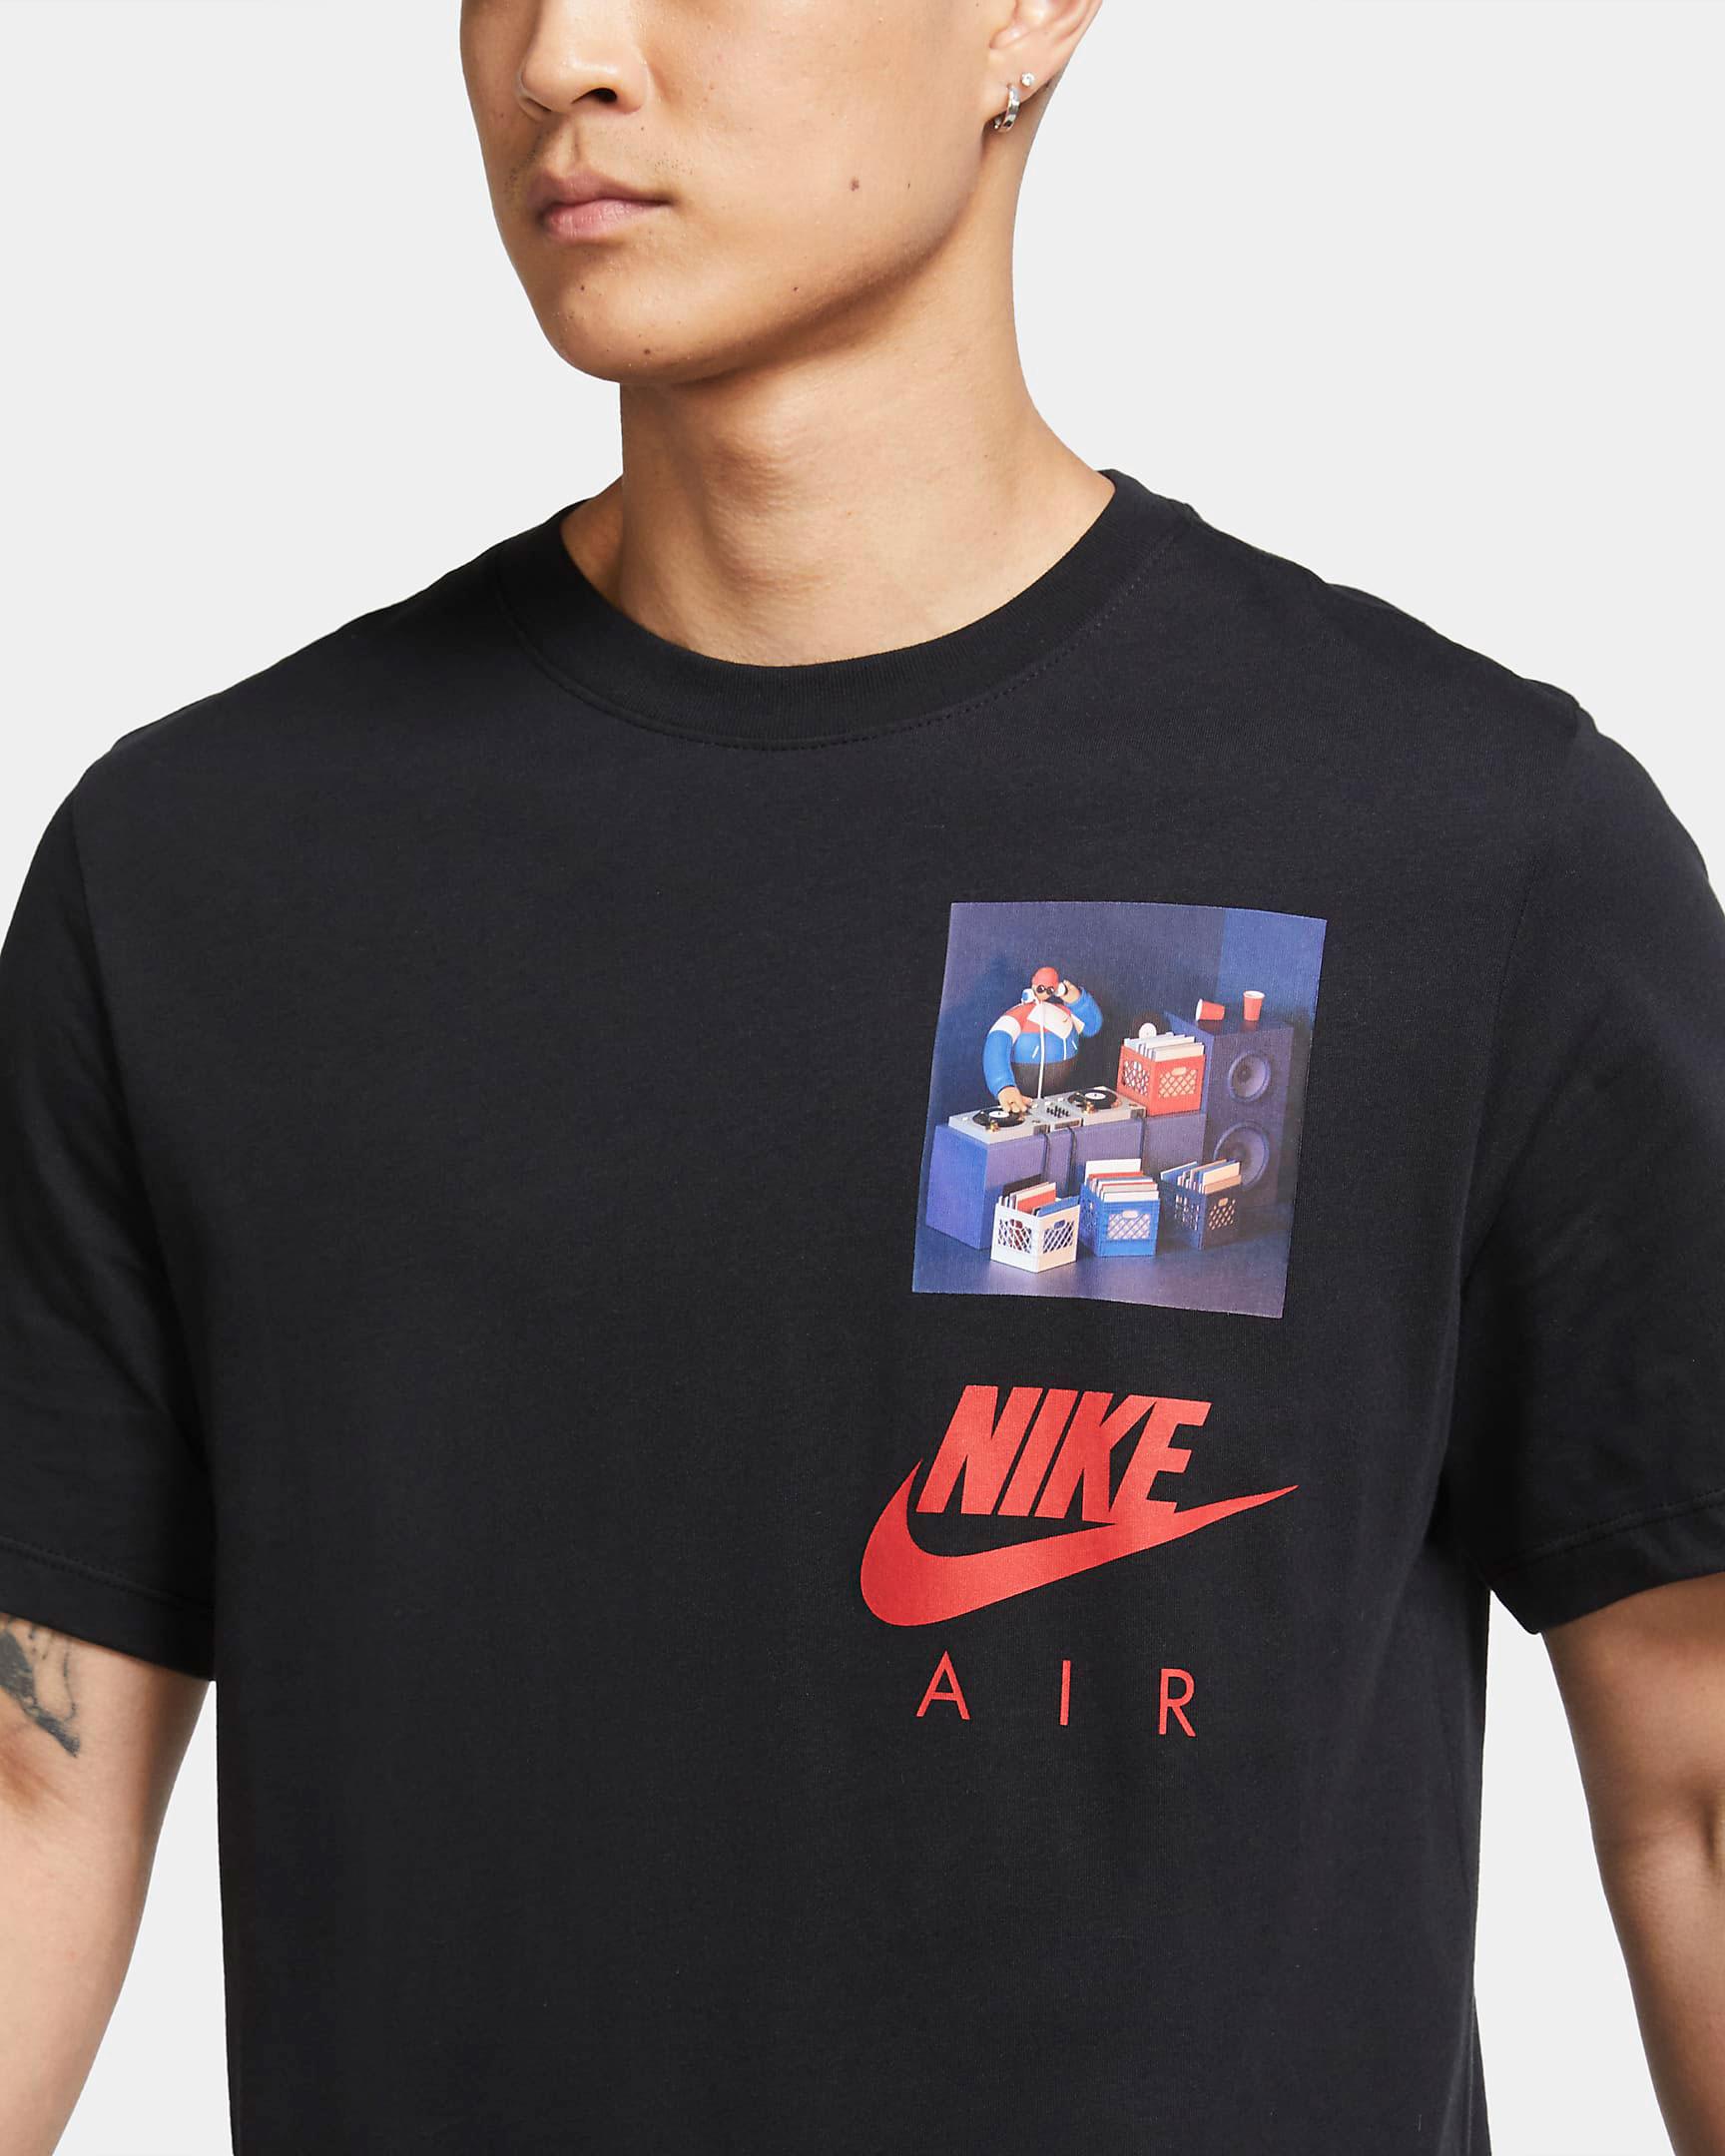 nike-air-foamposite-one-gradient-soles-shirt-3